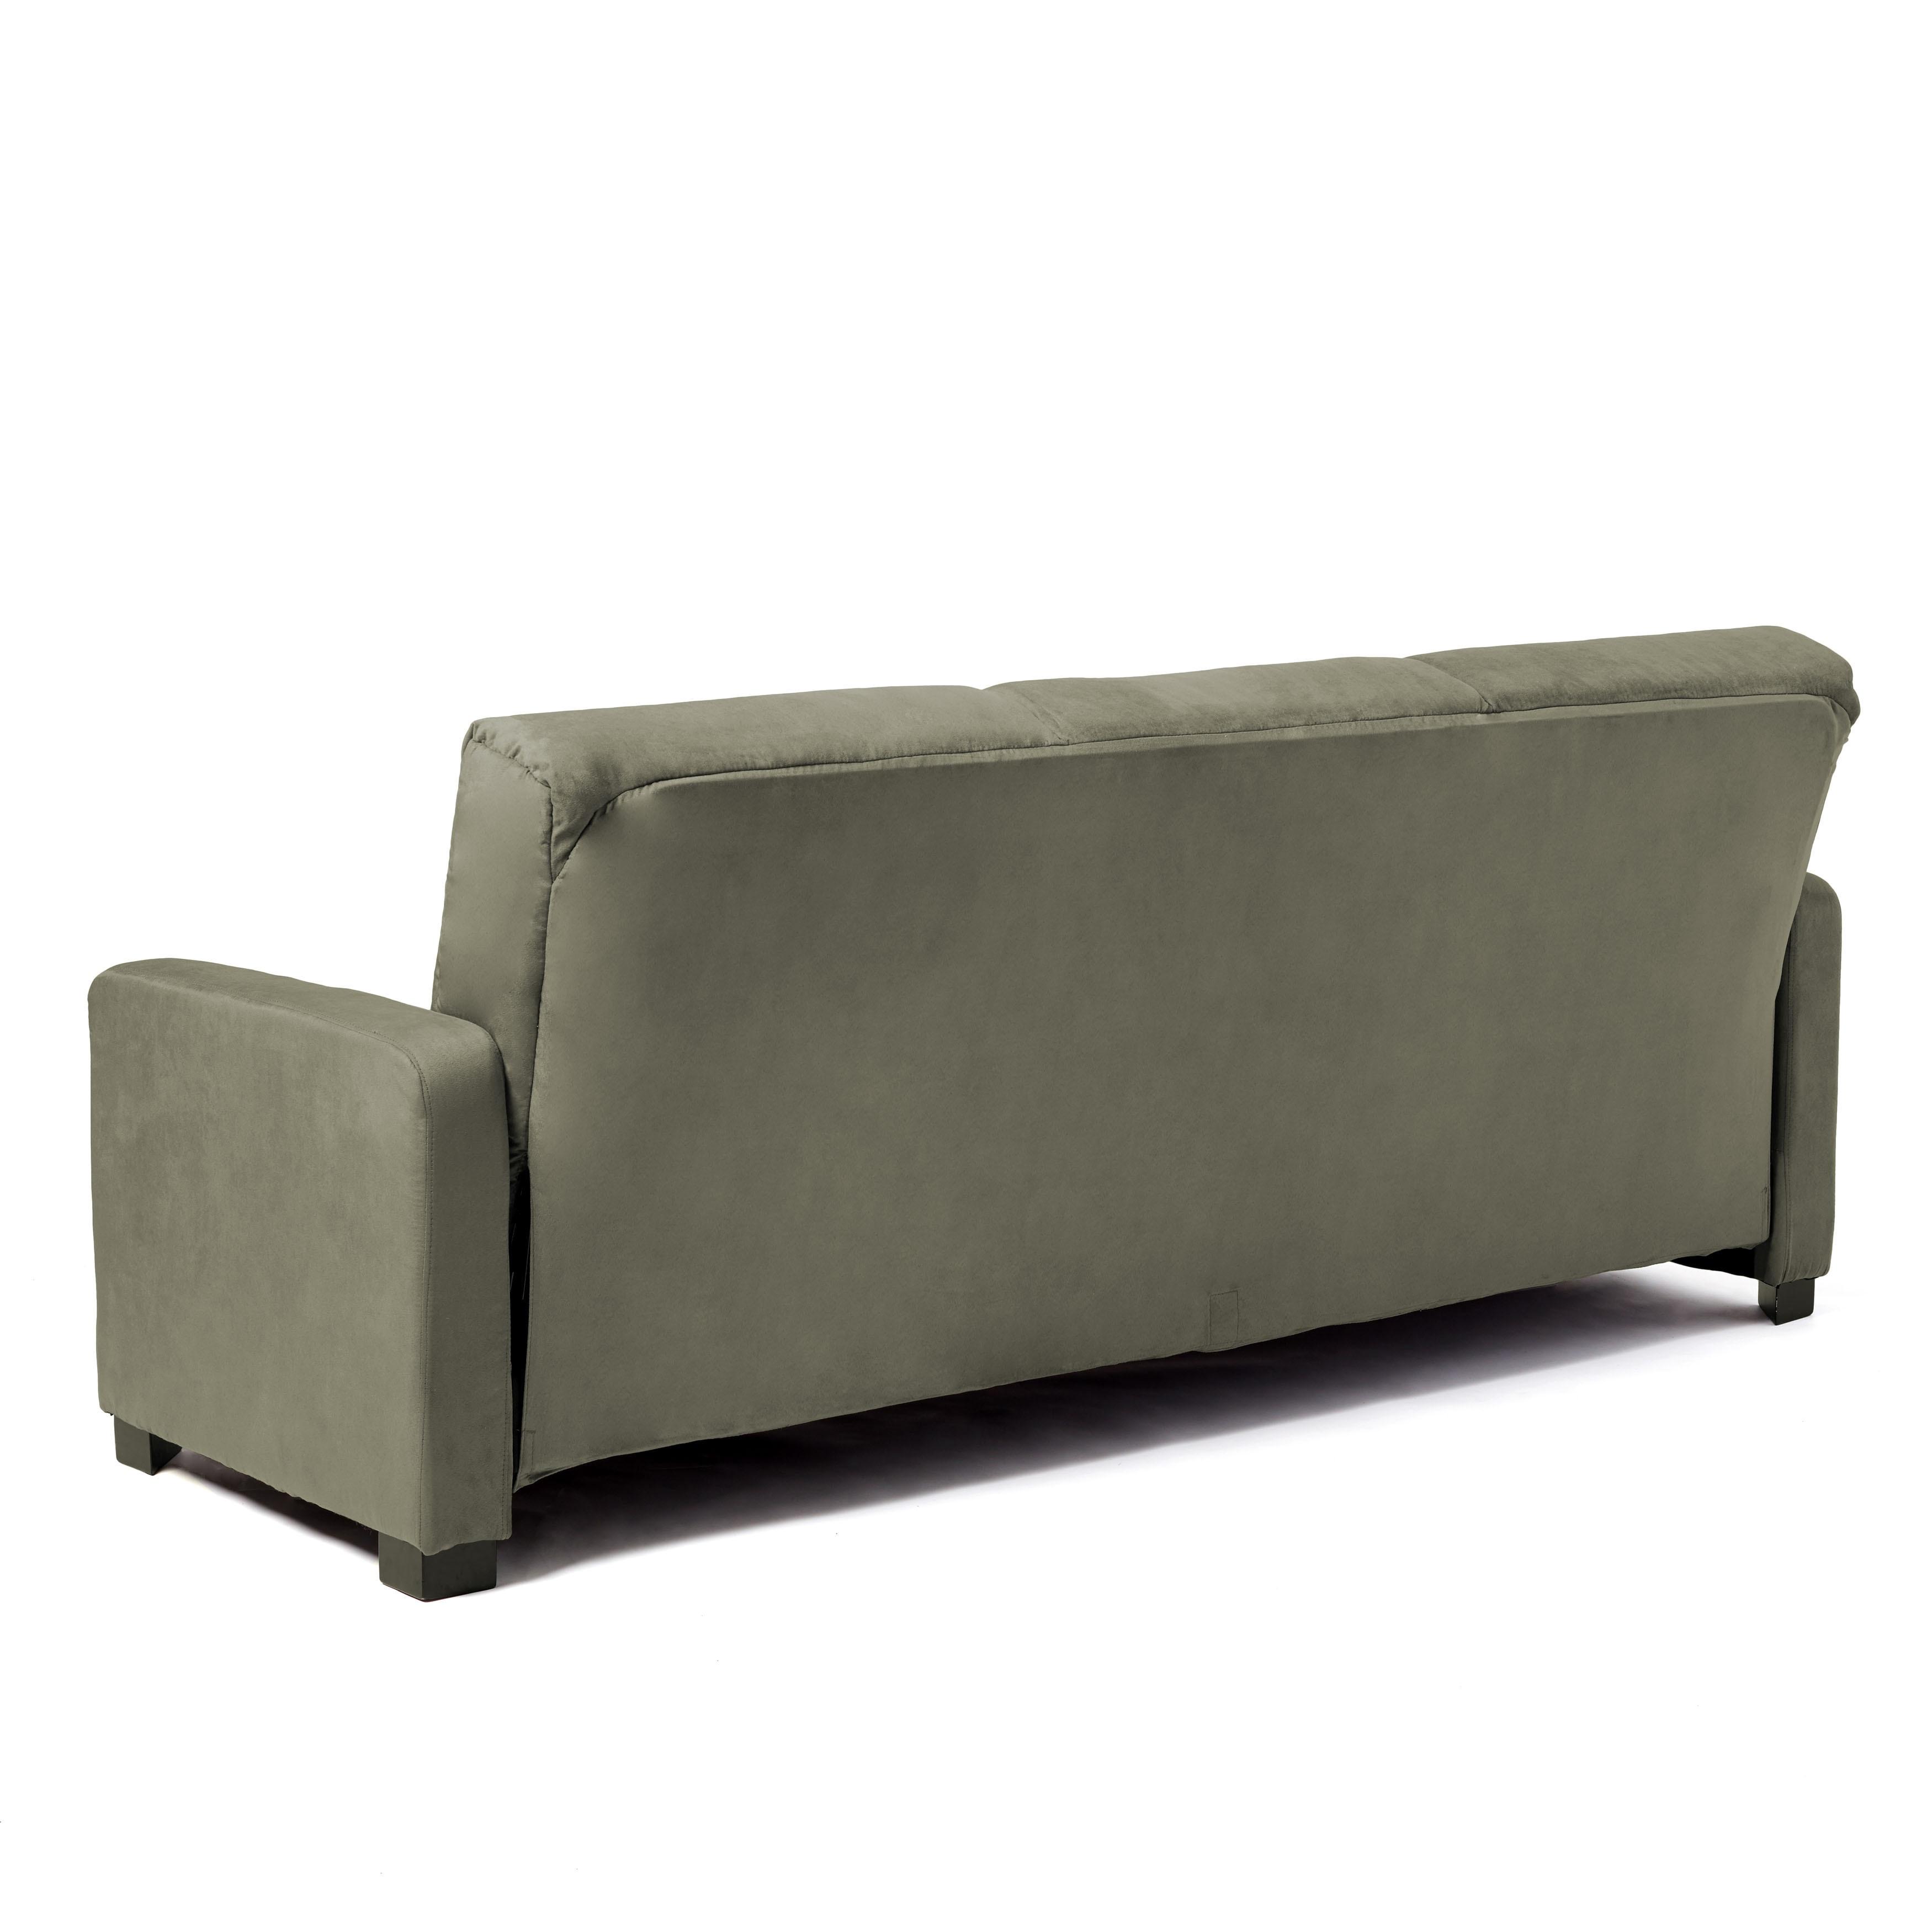 Shop Handy Living Trace Convert A Couch Sage Grey Microfiber Futon